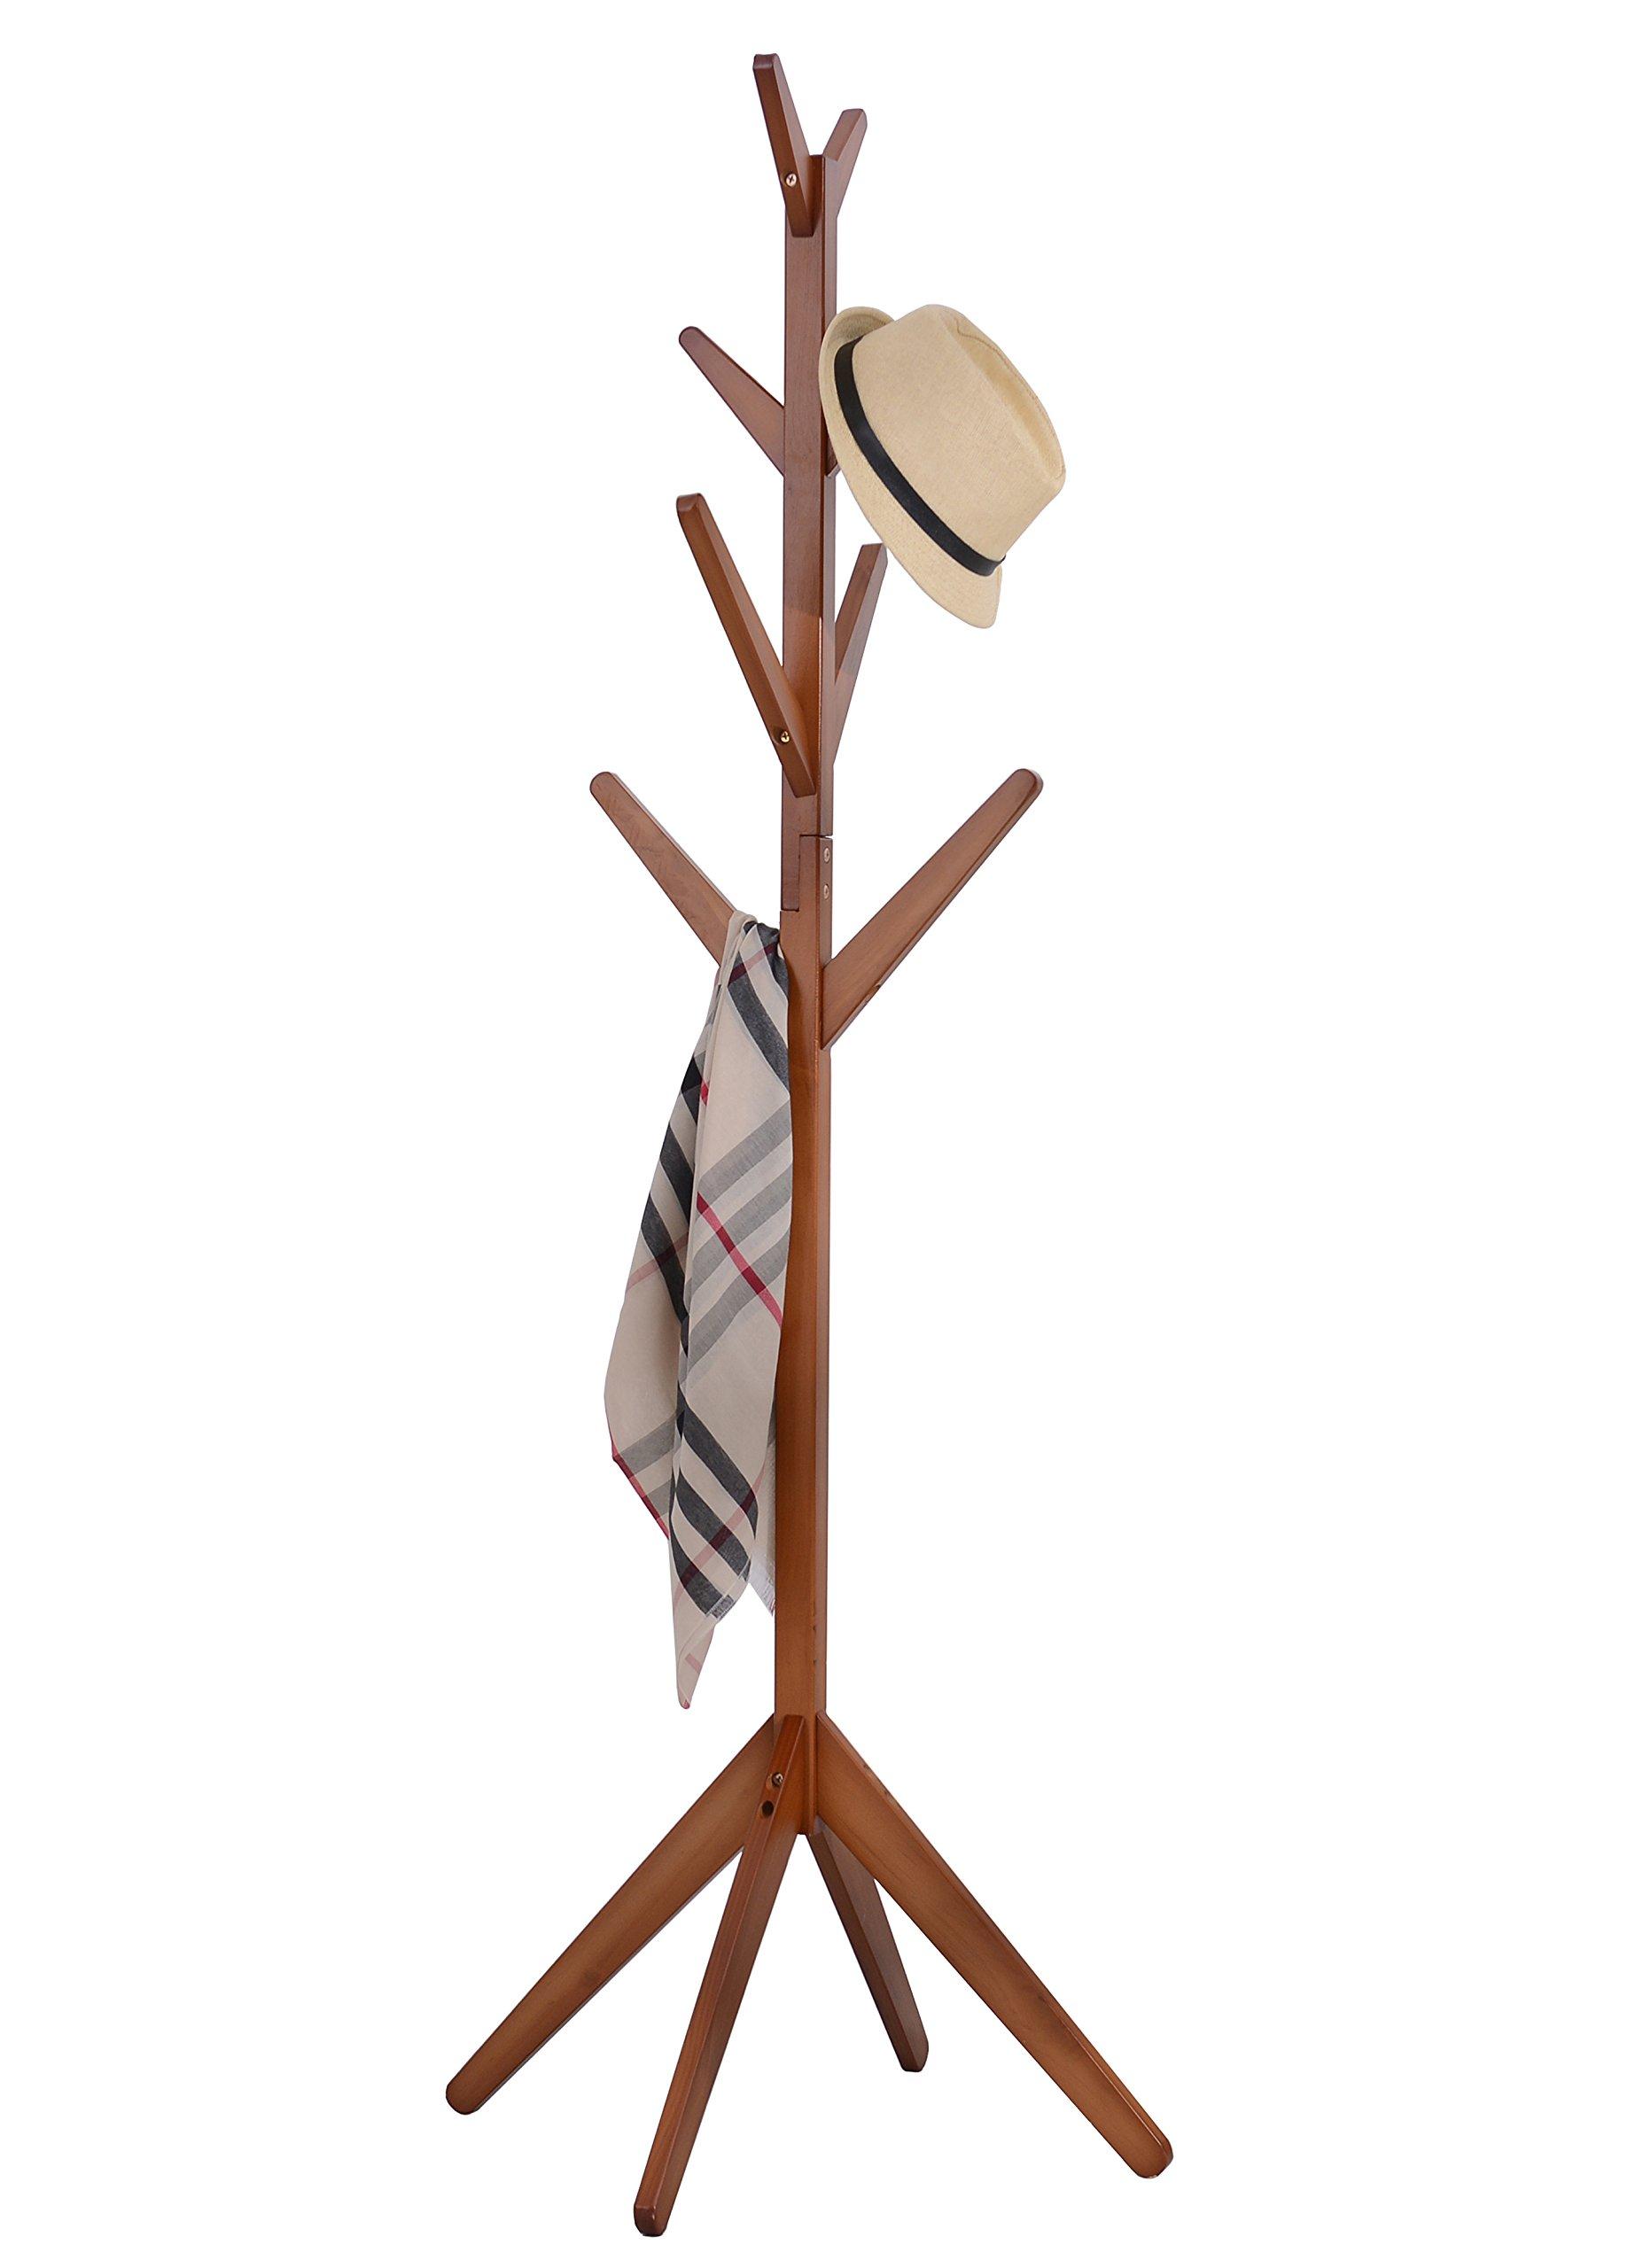 Neasyth Solid Wood Coat Rack SimpleEntryway Standing Hall Tree Tetrapod Base for Hat Jacket Coat Hanger Rack in Living Room Bedroom